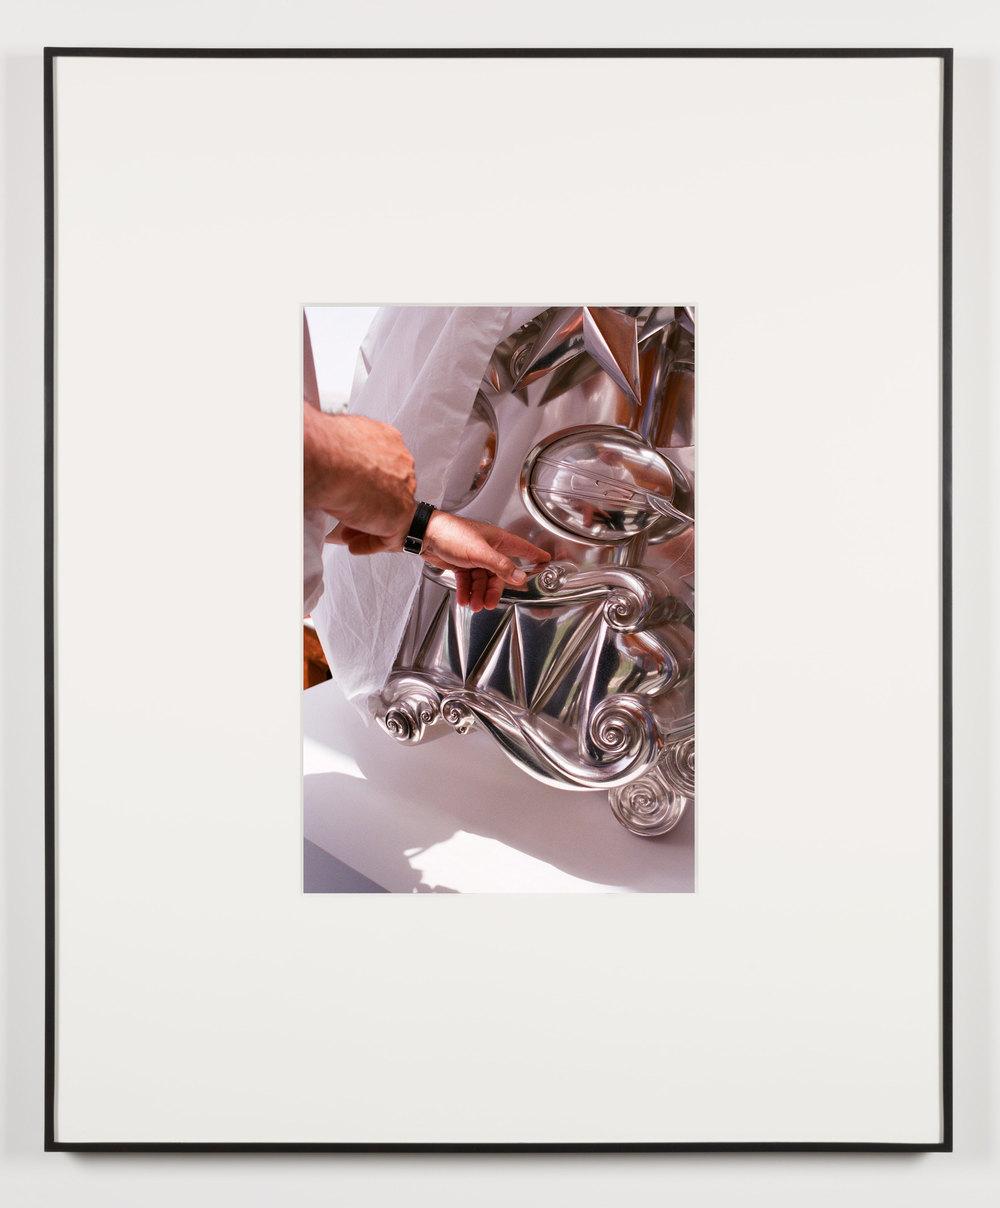 Alphabet der Leidenschaft (Beirut, Lebanon, June 1, 2013)    2014   Chromogenic print  20 x 13 1/2 inches   Art Handling, 2011–